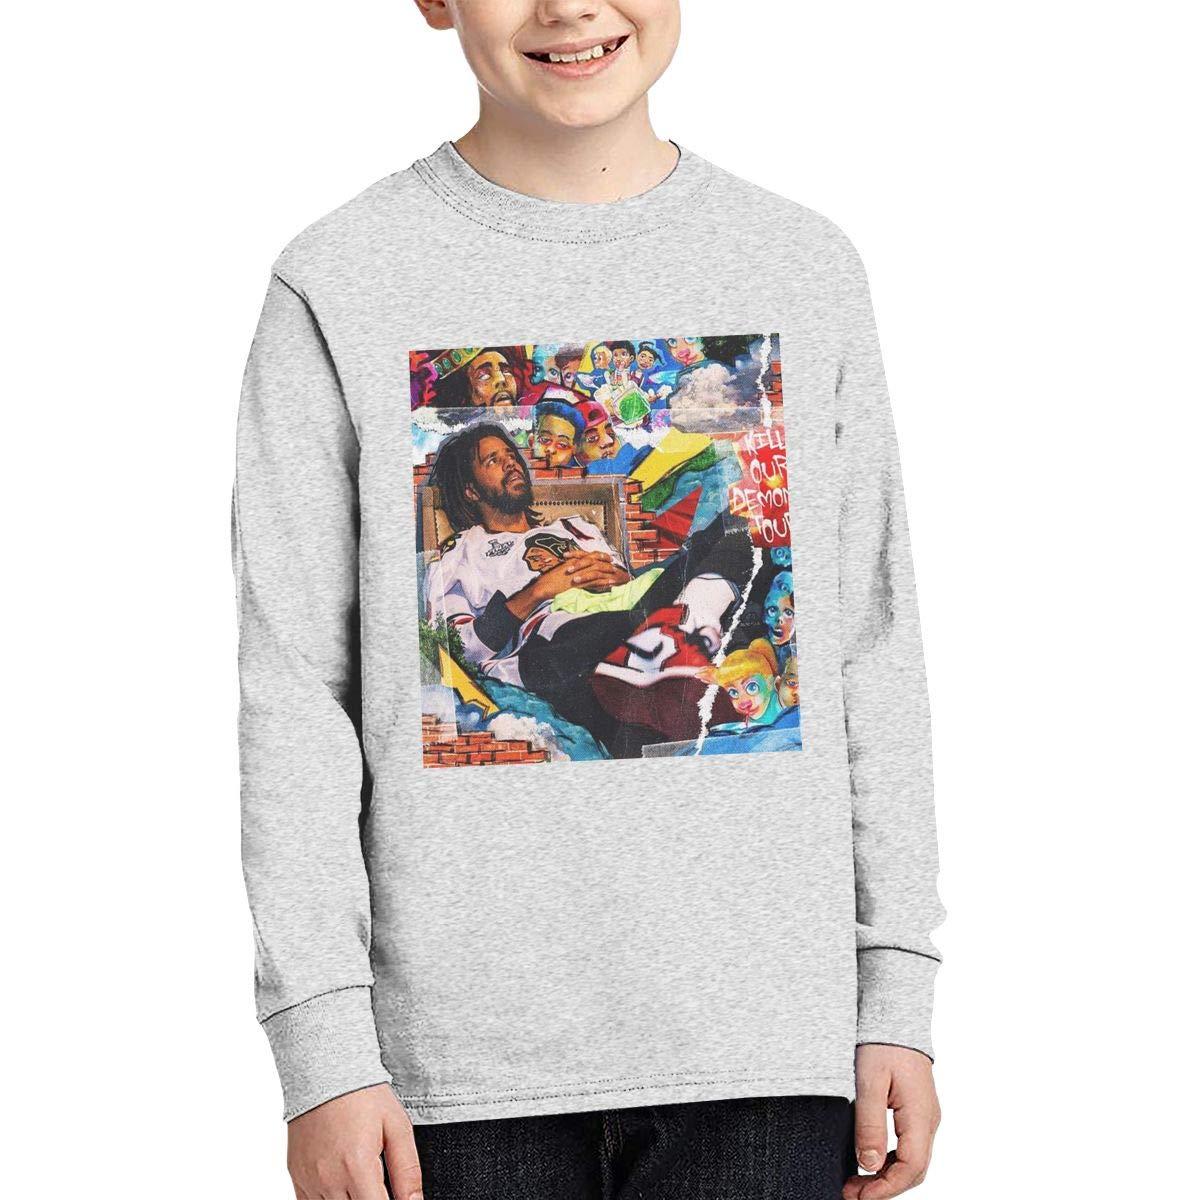 Youth J.-Cole Long Sleeves Shirt Boys Girls